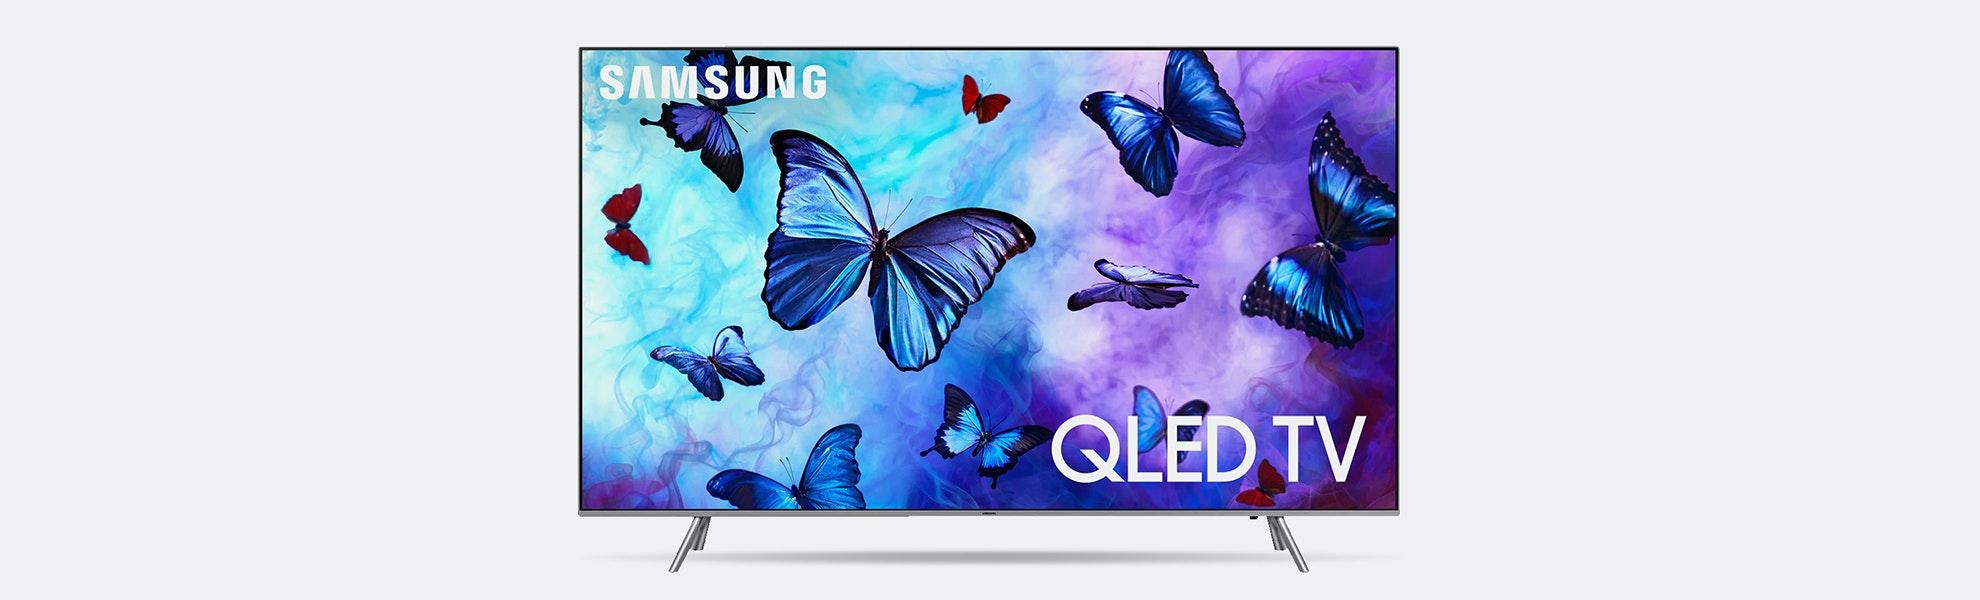 "Samsung 82"" Class Q6FN QLED Smart 4K UHD TV (2018)"